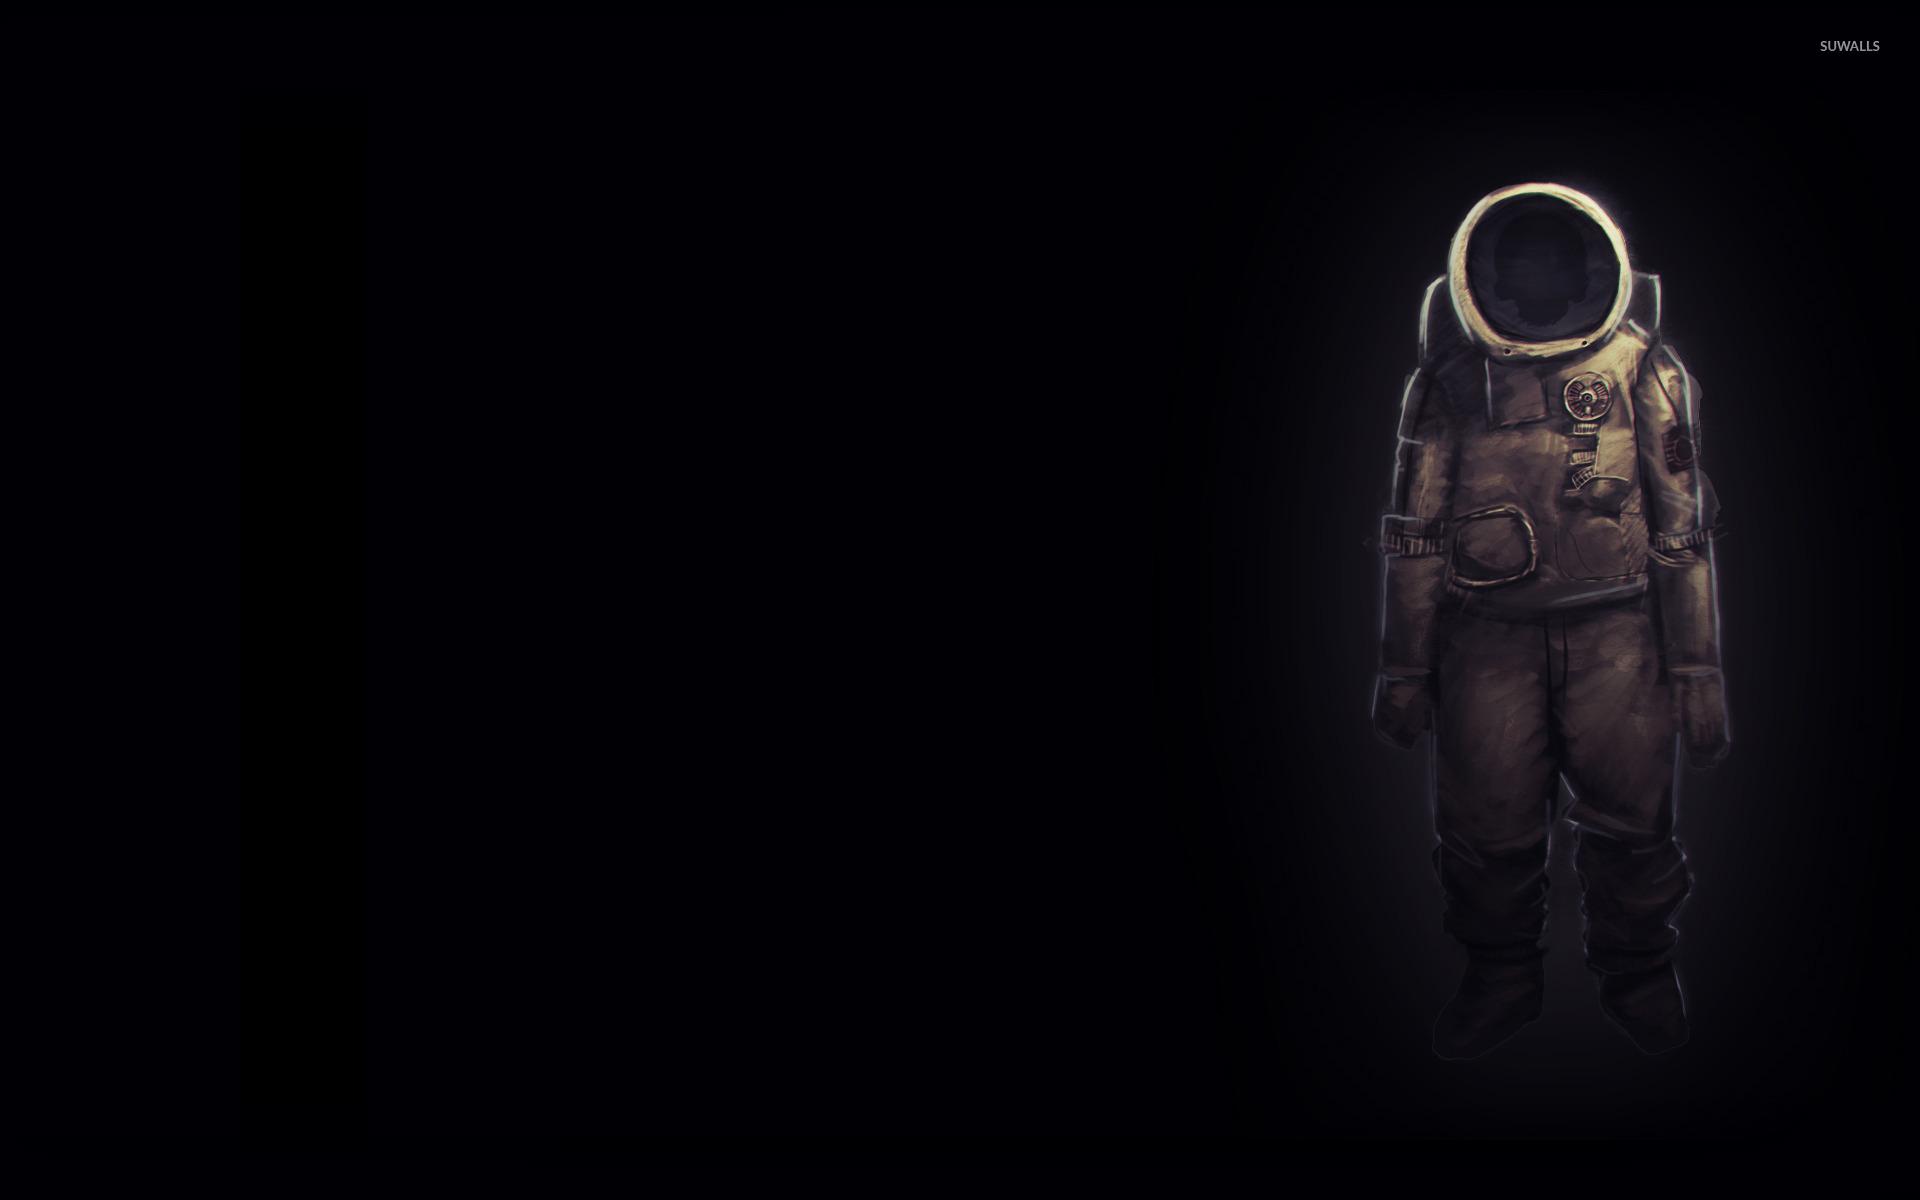 Astronaut 3 Wallpaper